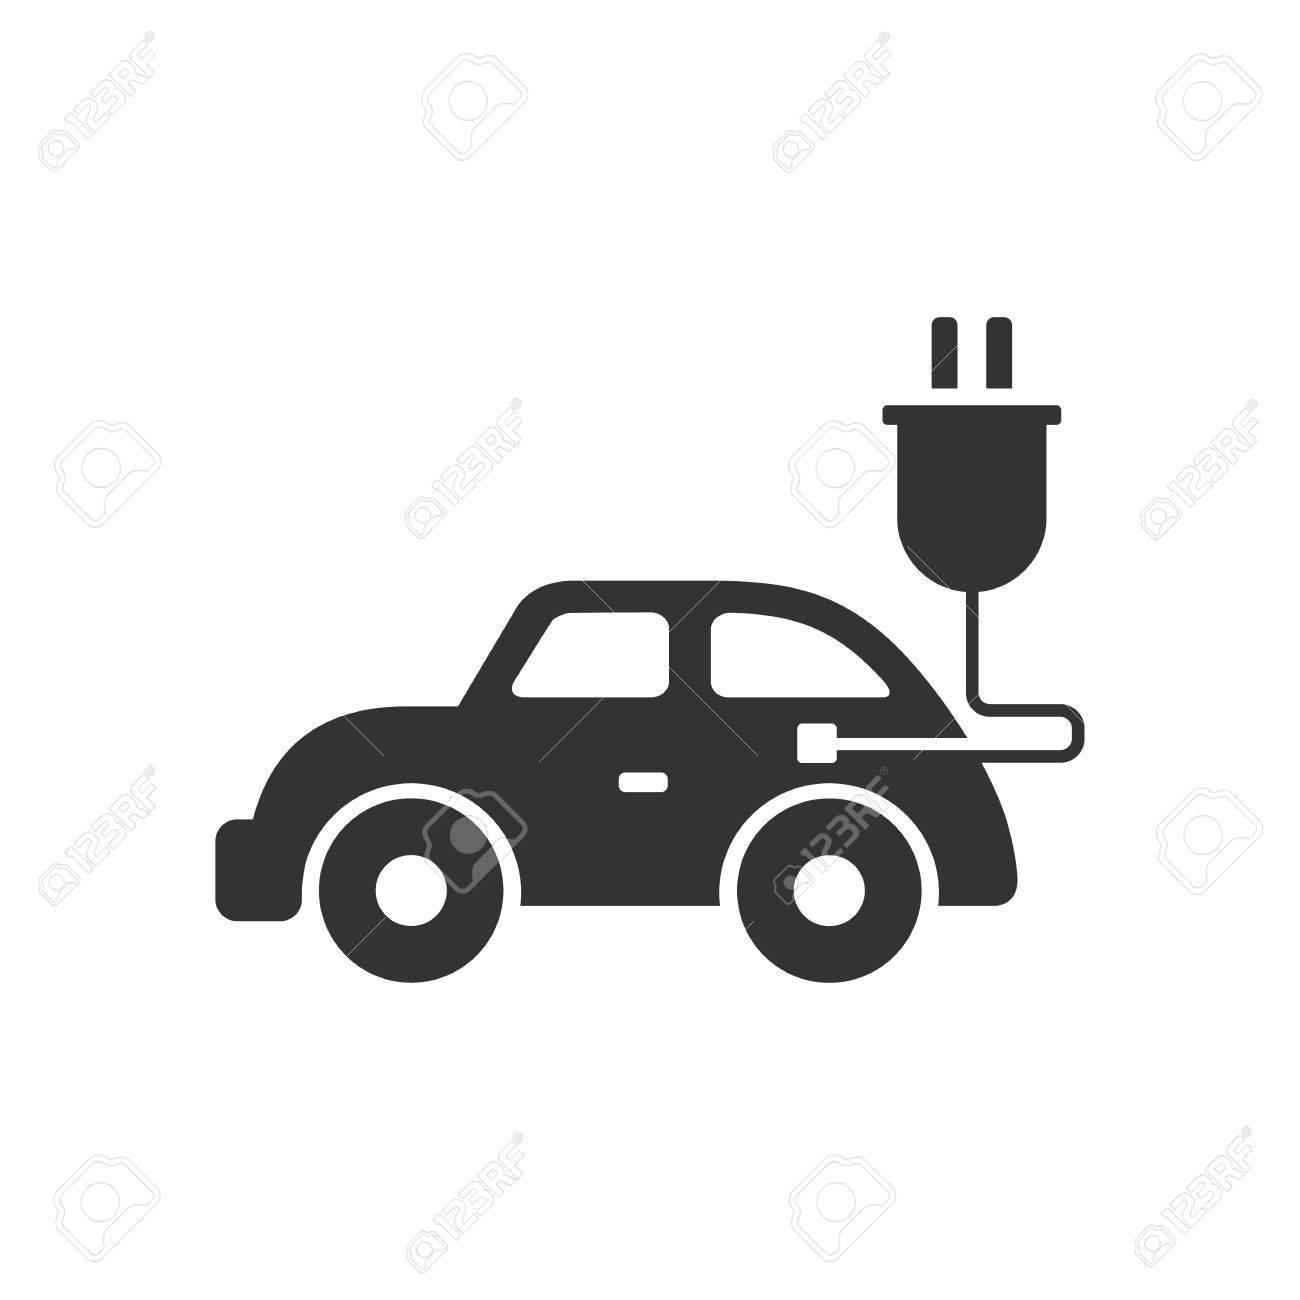 Elektro-Auto-Symbol In Einzelne Graue Farbe. Fahrzeug, Umwelt ...